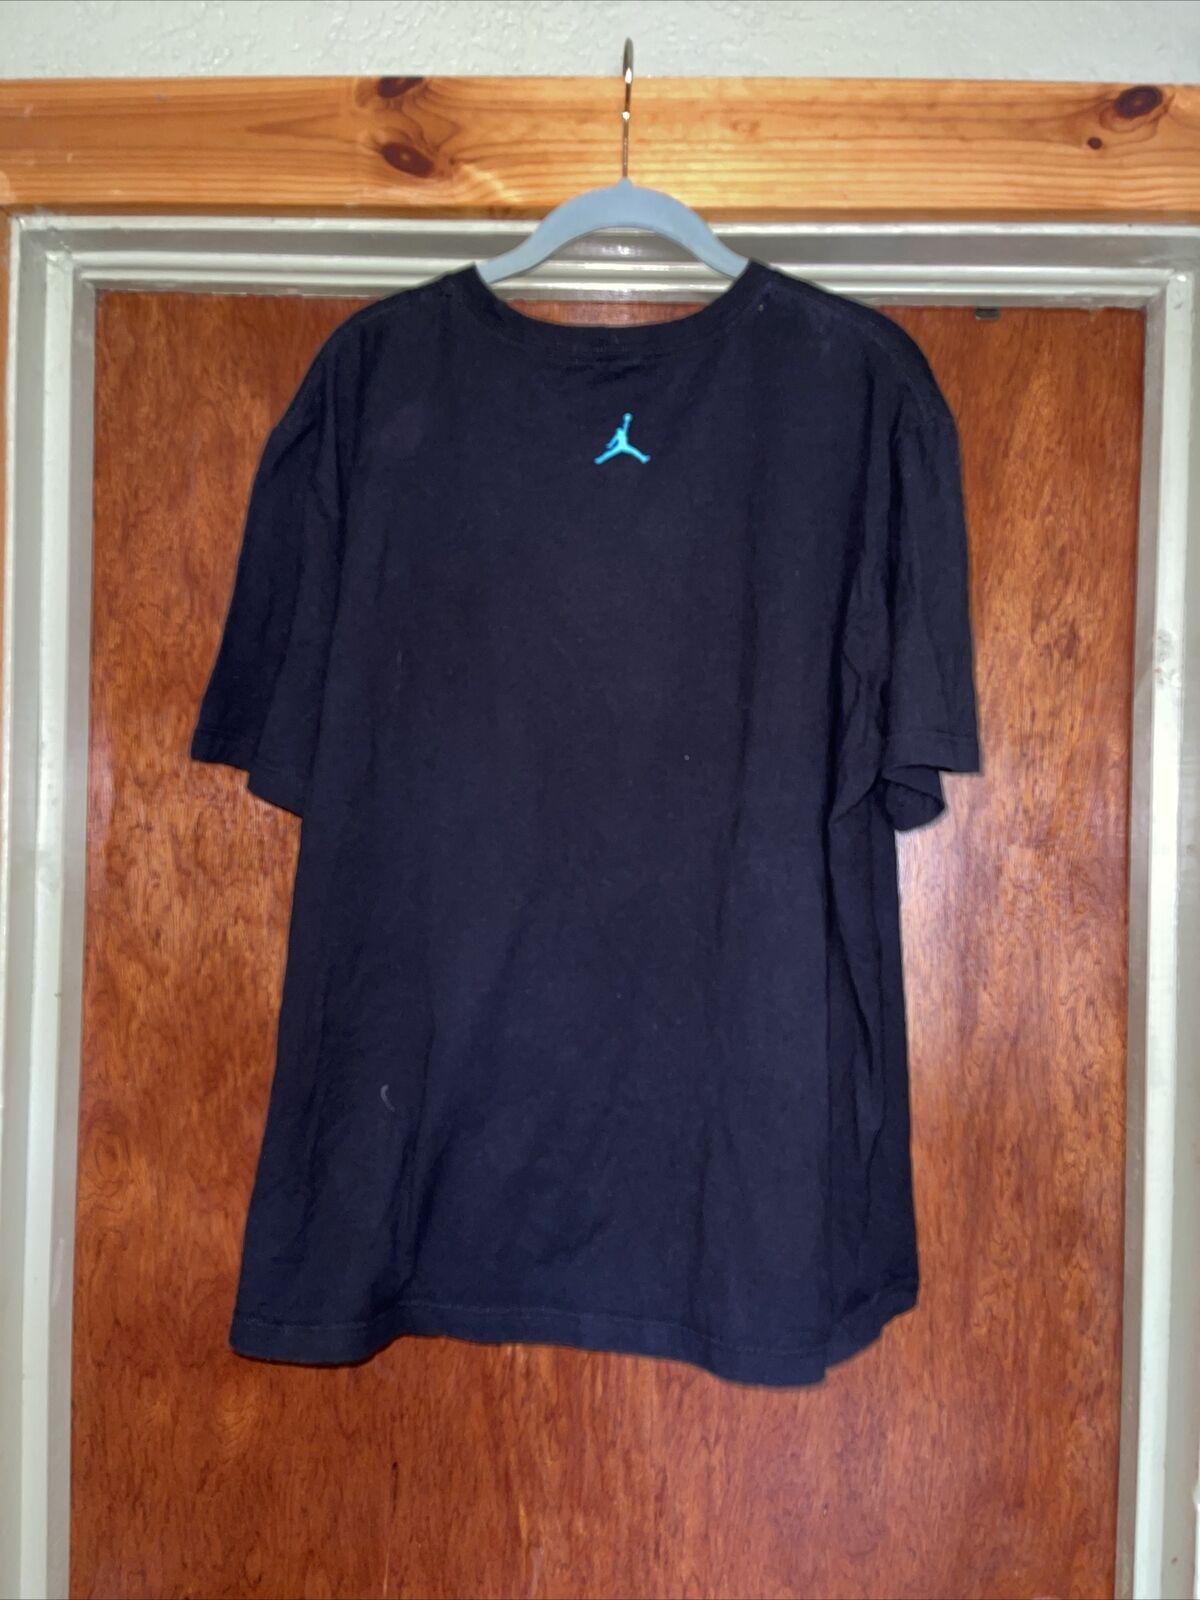 Lot Of 3 Jordan Retro 3 T-shirt Tee Shirts Men Si… - image 5